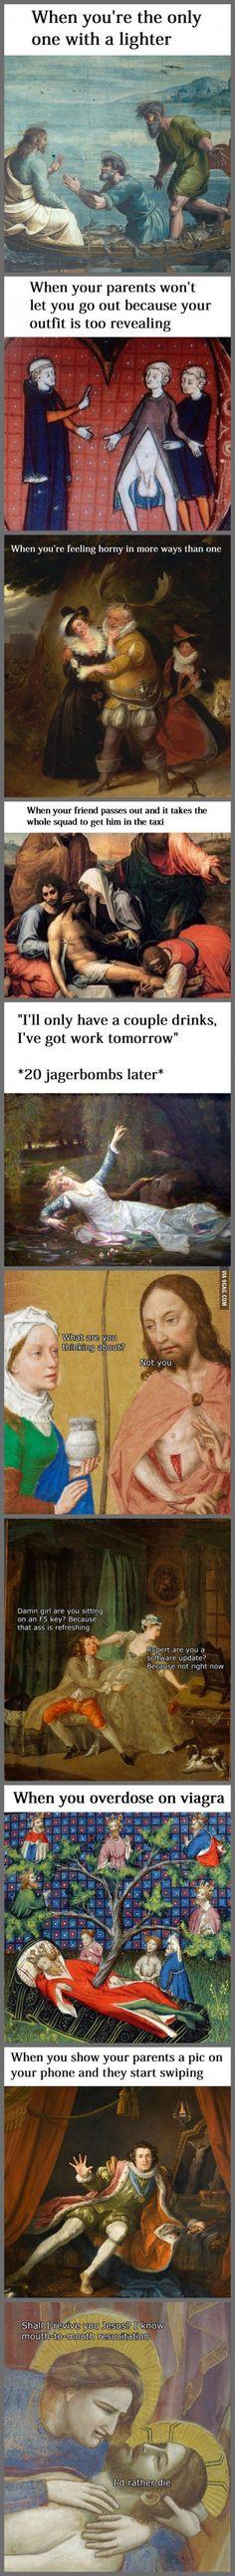 Classical Art Memes Latest (Part-16)